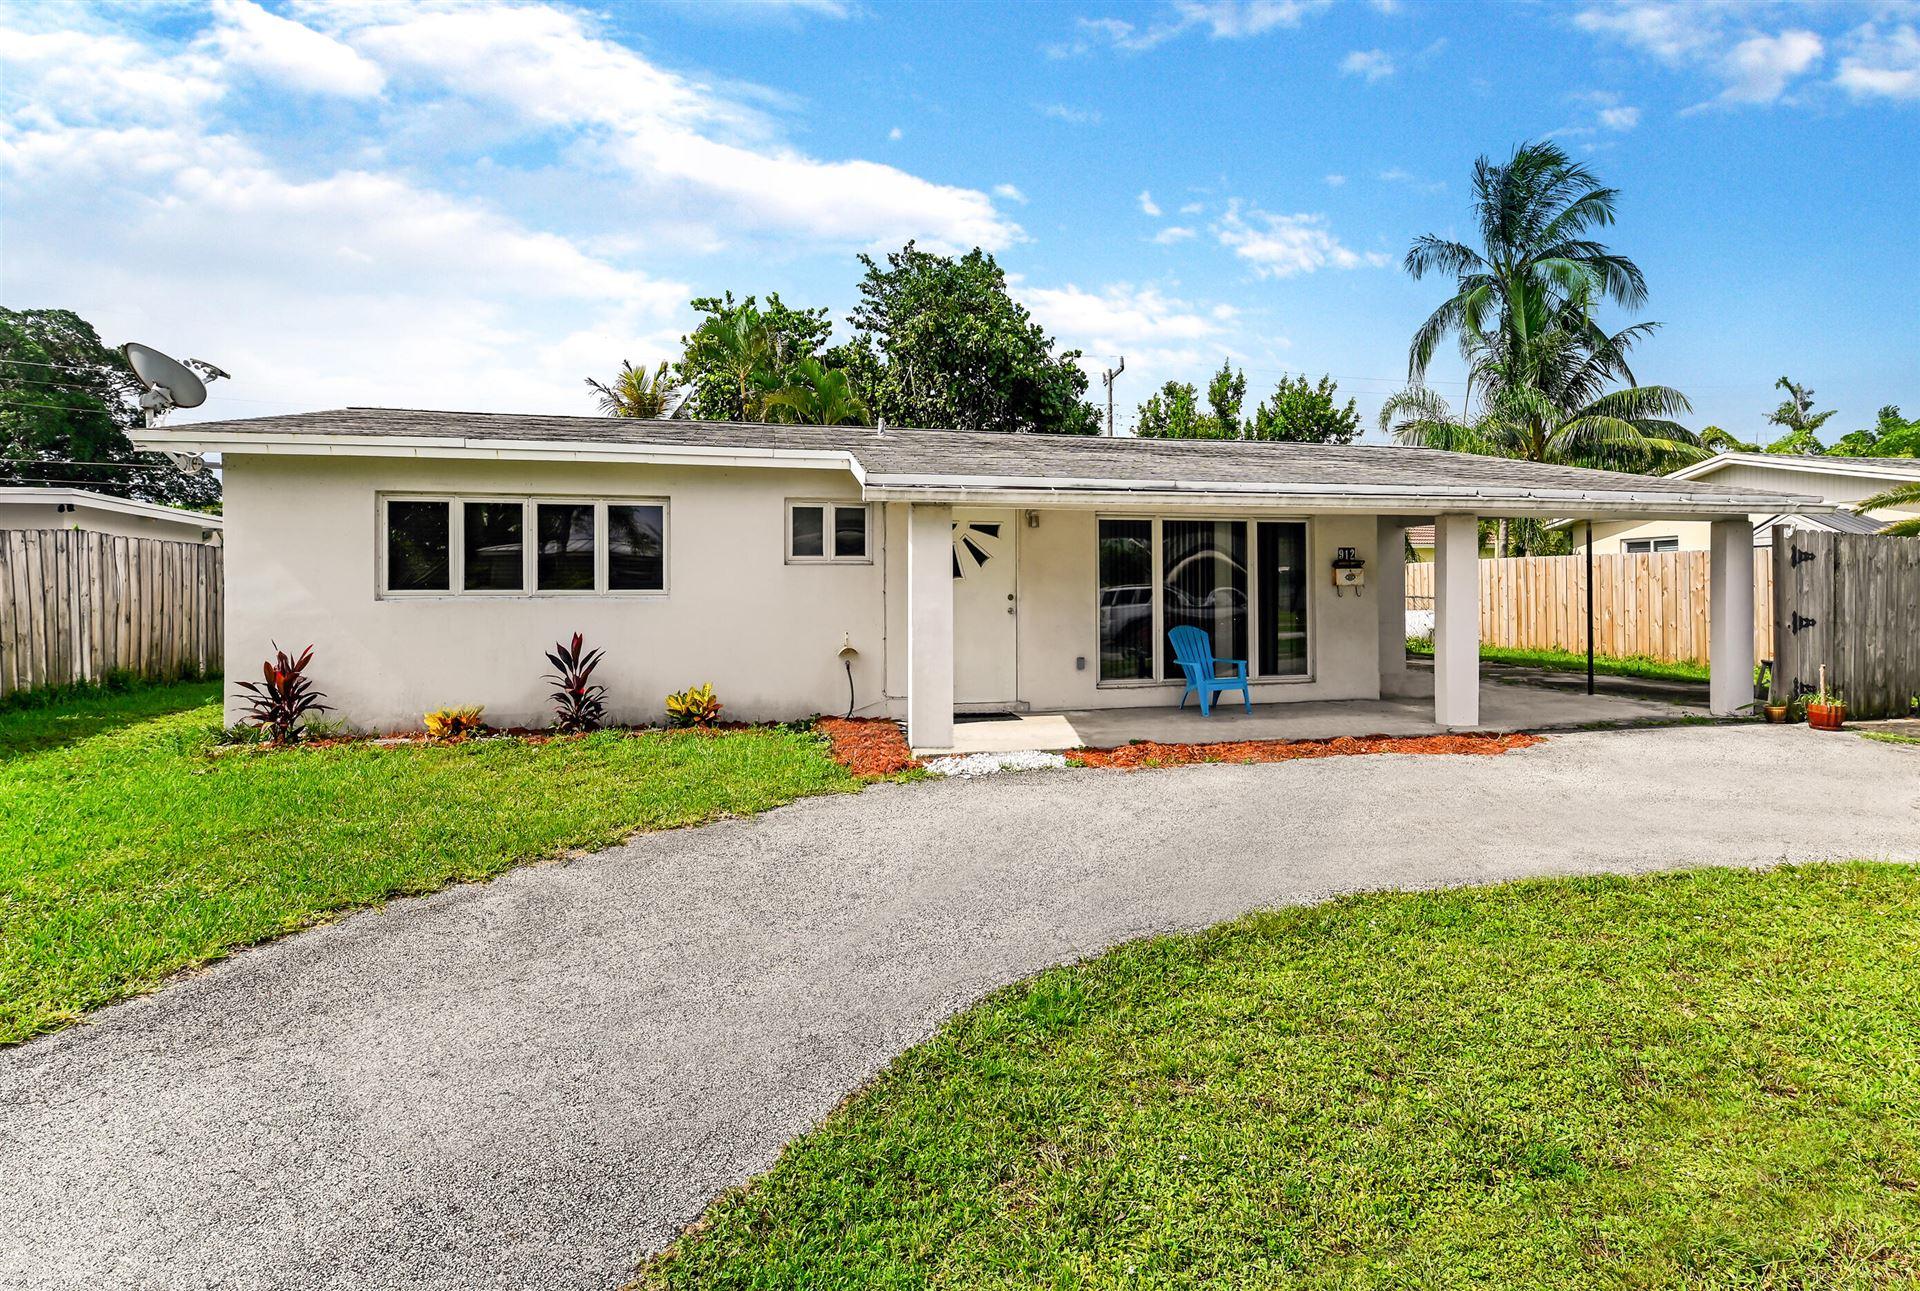 Photo of 912 SE 13th Street, Deerfield Beach, FL 33441 (MLS # RX-10733030)